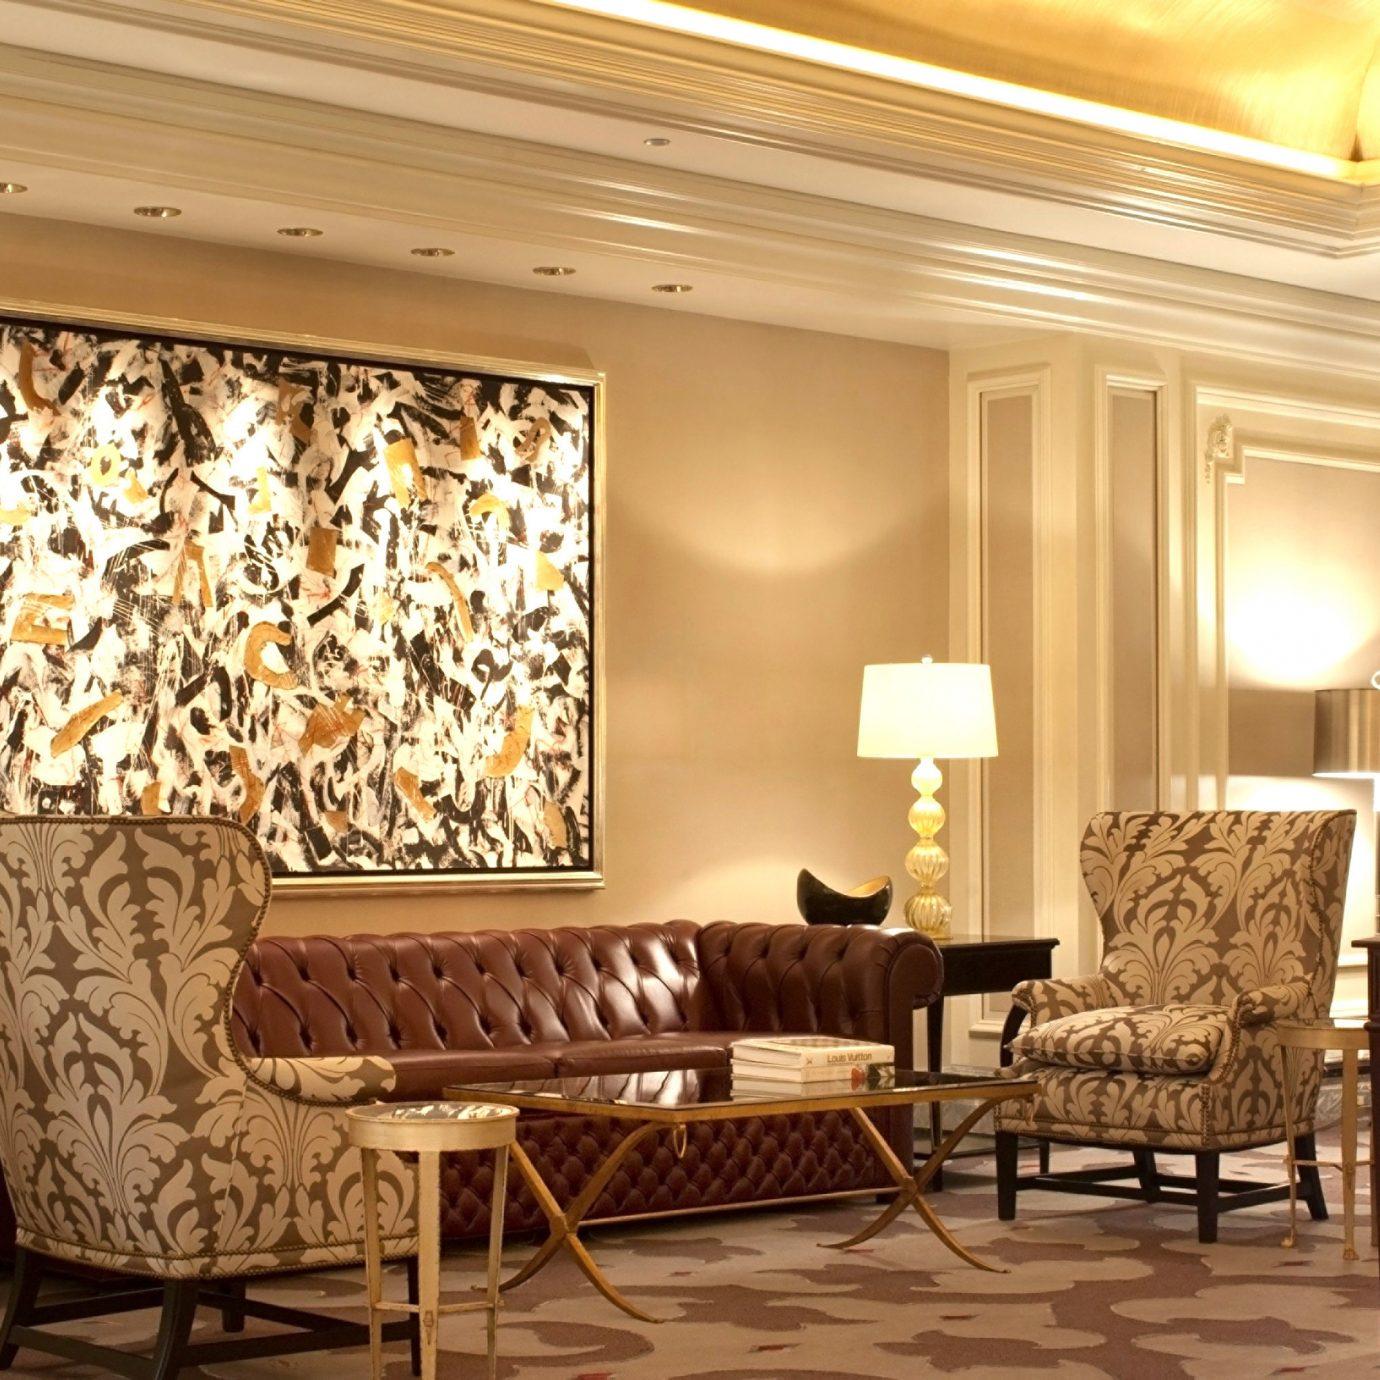 Hip Lounge Luxury Modern chair property living room Lobby Suite lighting home condominium